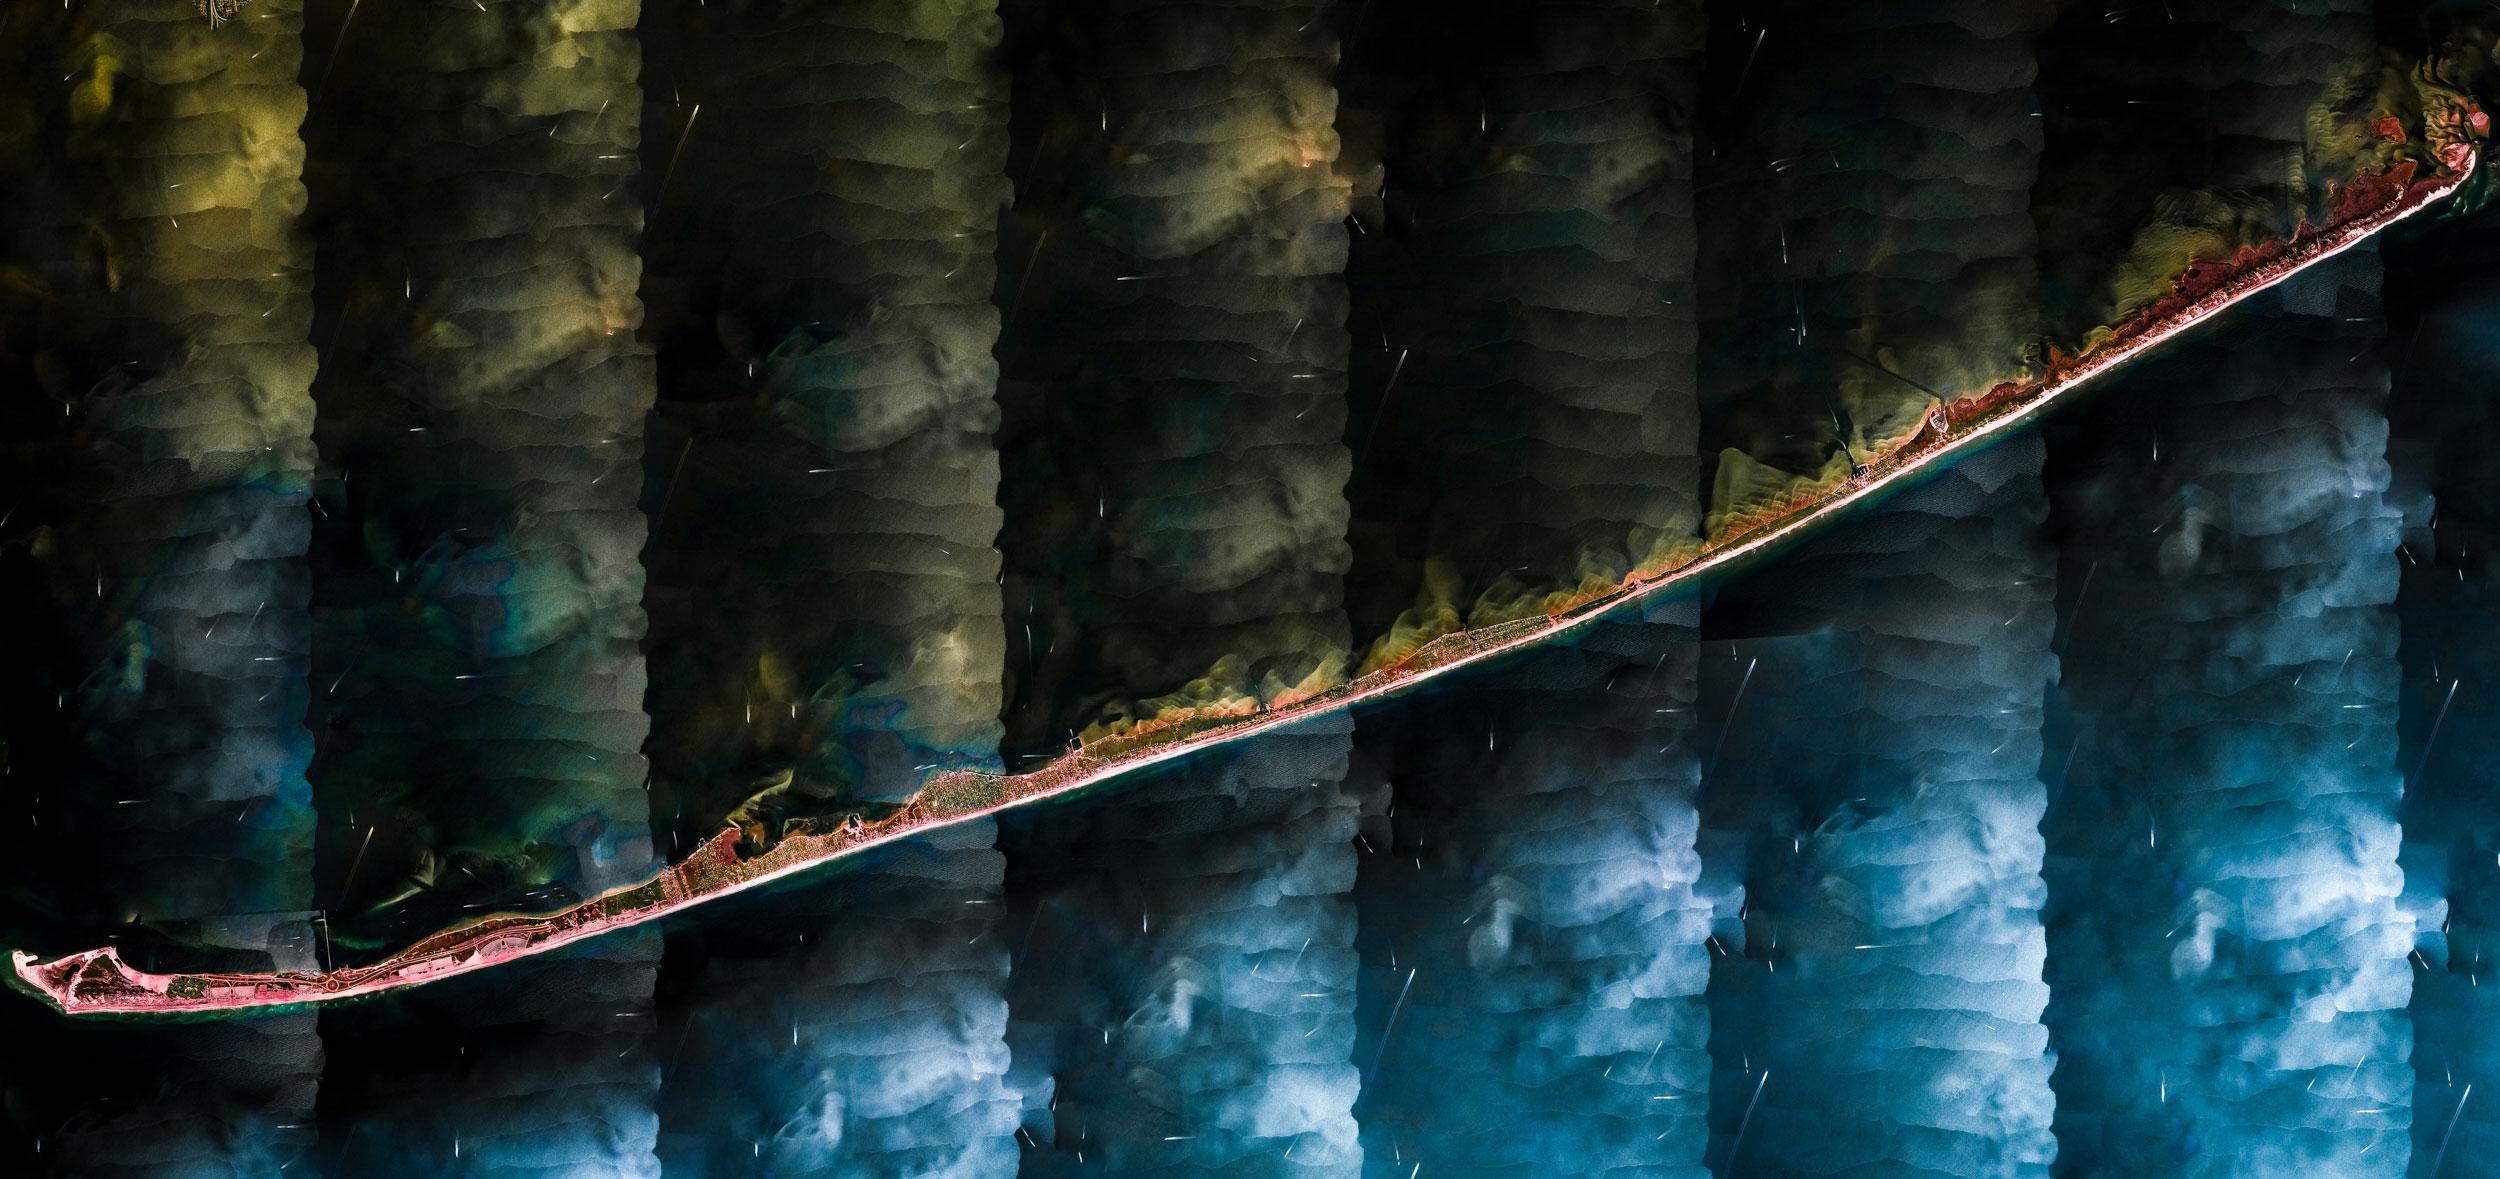 Fire-Island-ULTRADISTANCIA-©Federico-Winer.jpg